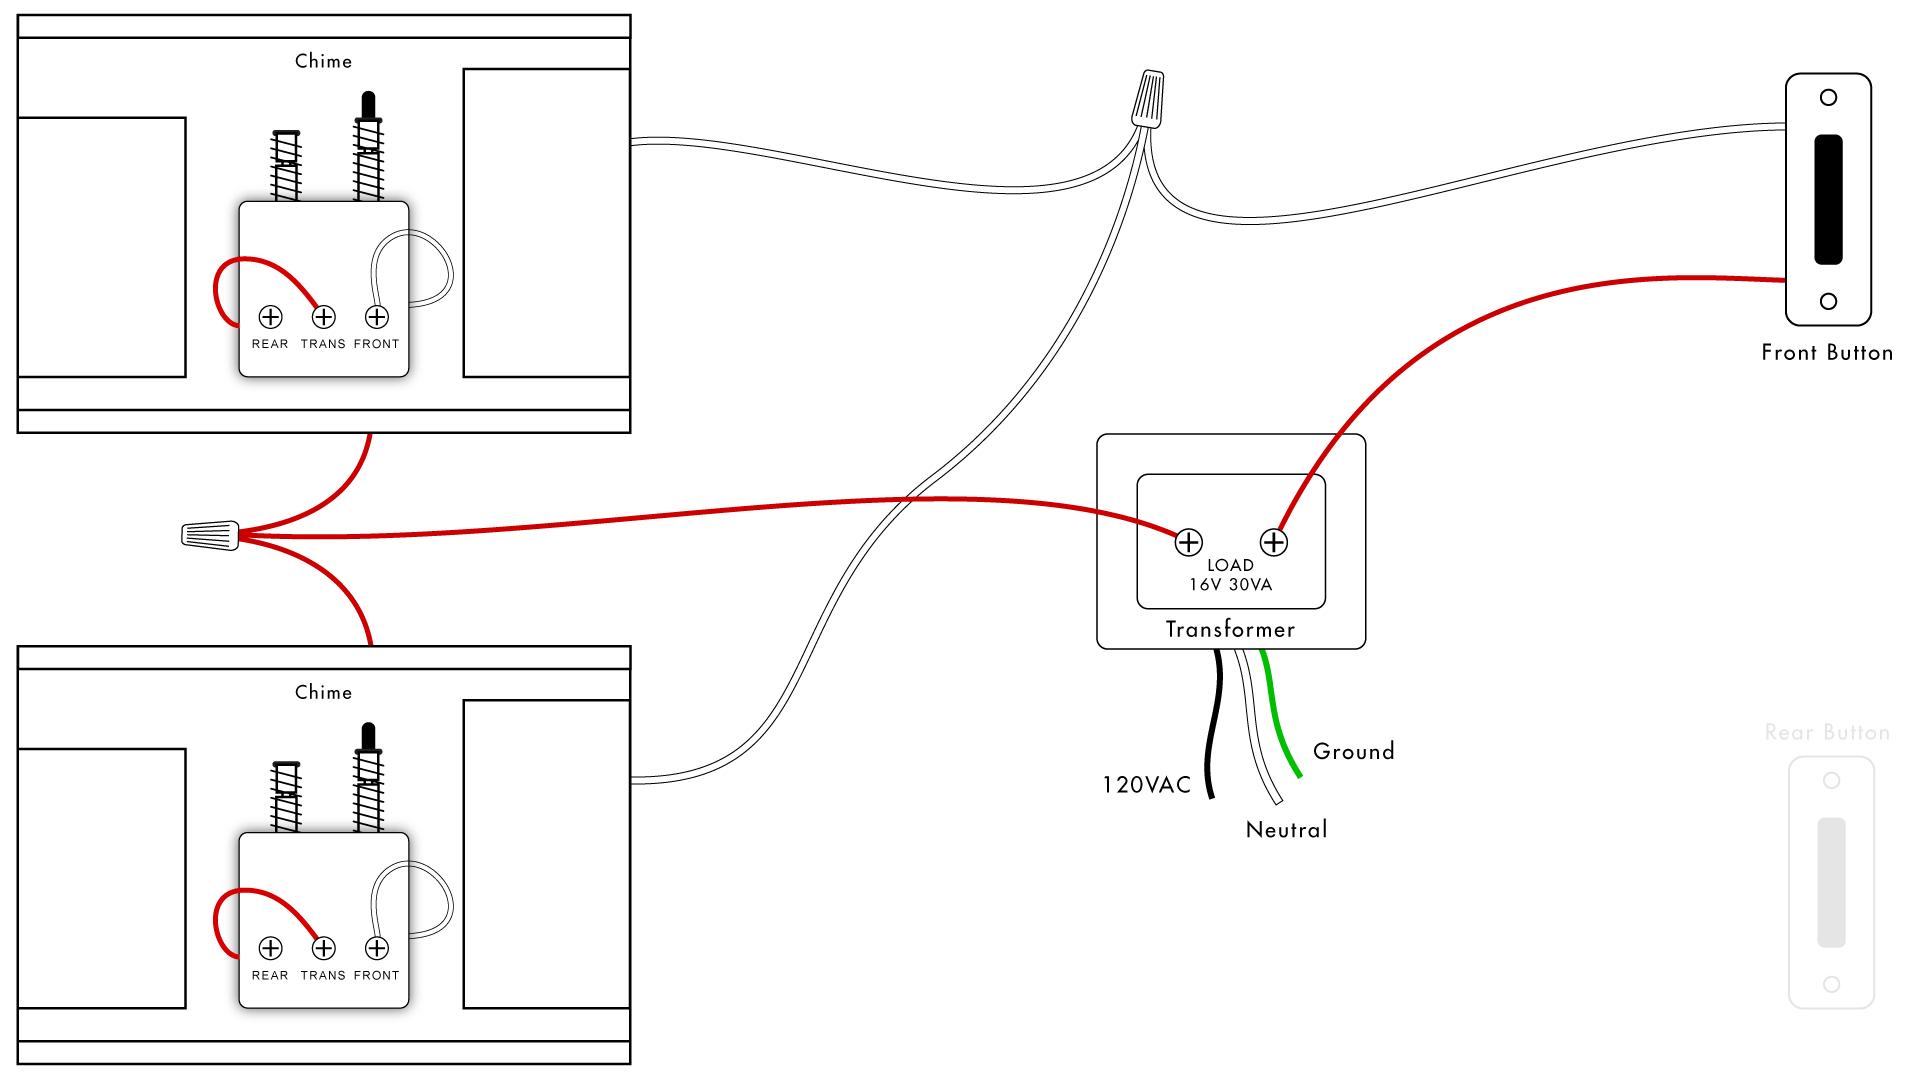 Doorbell Wiring Diagrams   Diy House Help - Doorbell Wiring Diagram